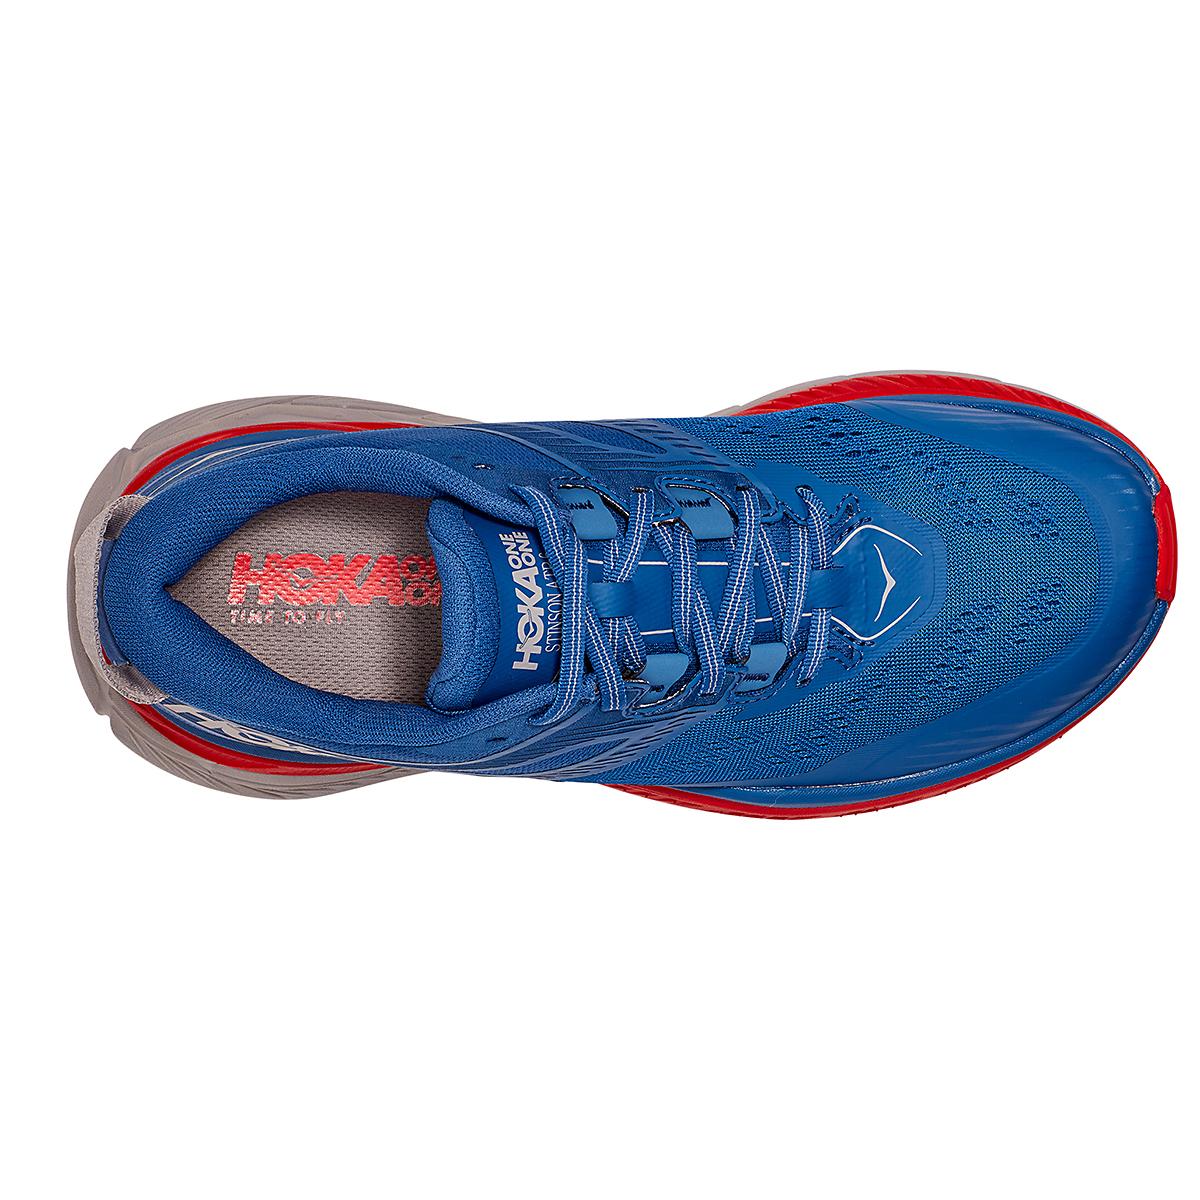 Men's Hoka One One Stinson Atr 6 Trail Running Shoe - Color: Dark Blue/High Risk Red - Size: 7 - Width: Regular, Dark Blue/High Risk Red, large, image 2